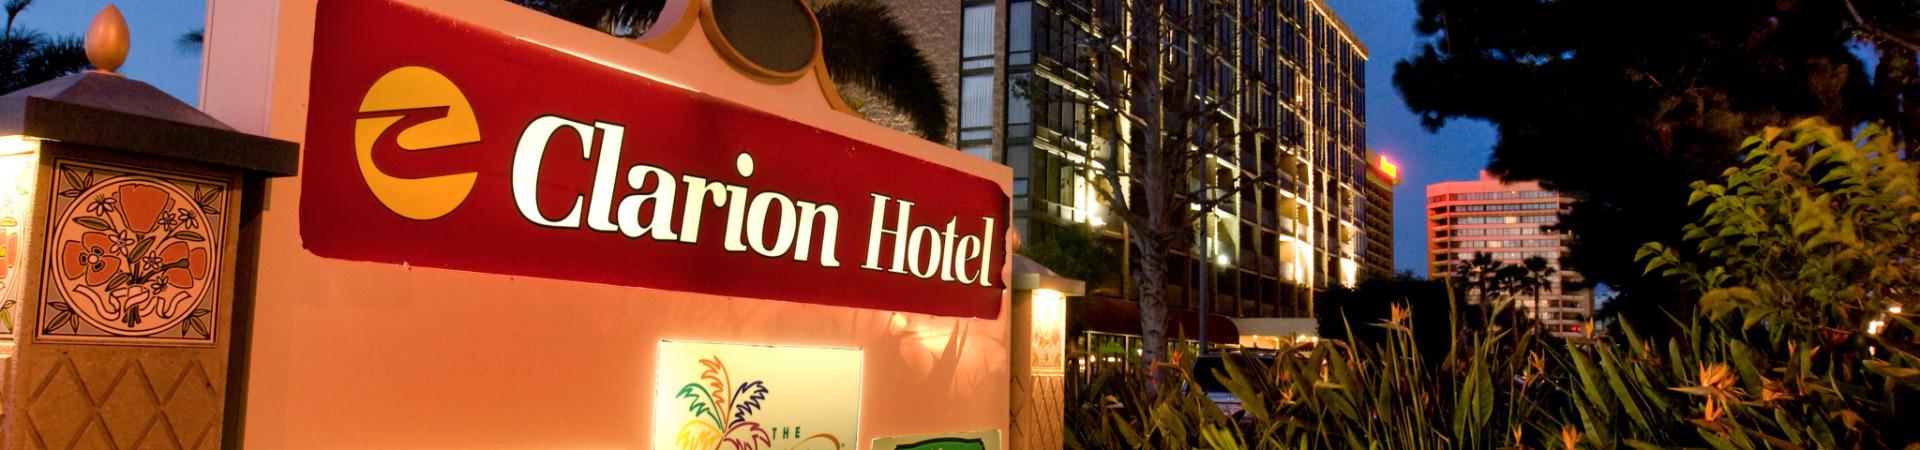 Anaheim Hotel Contact Directions Clarion Anaheim Hotel